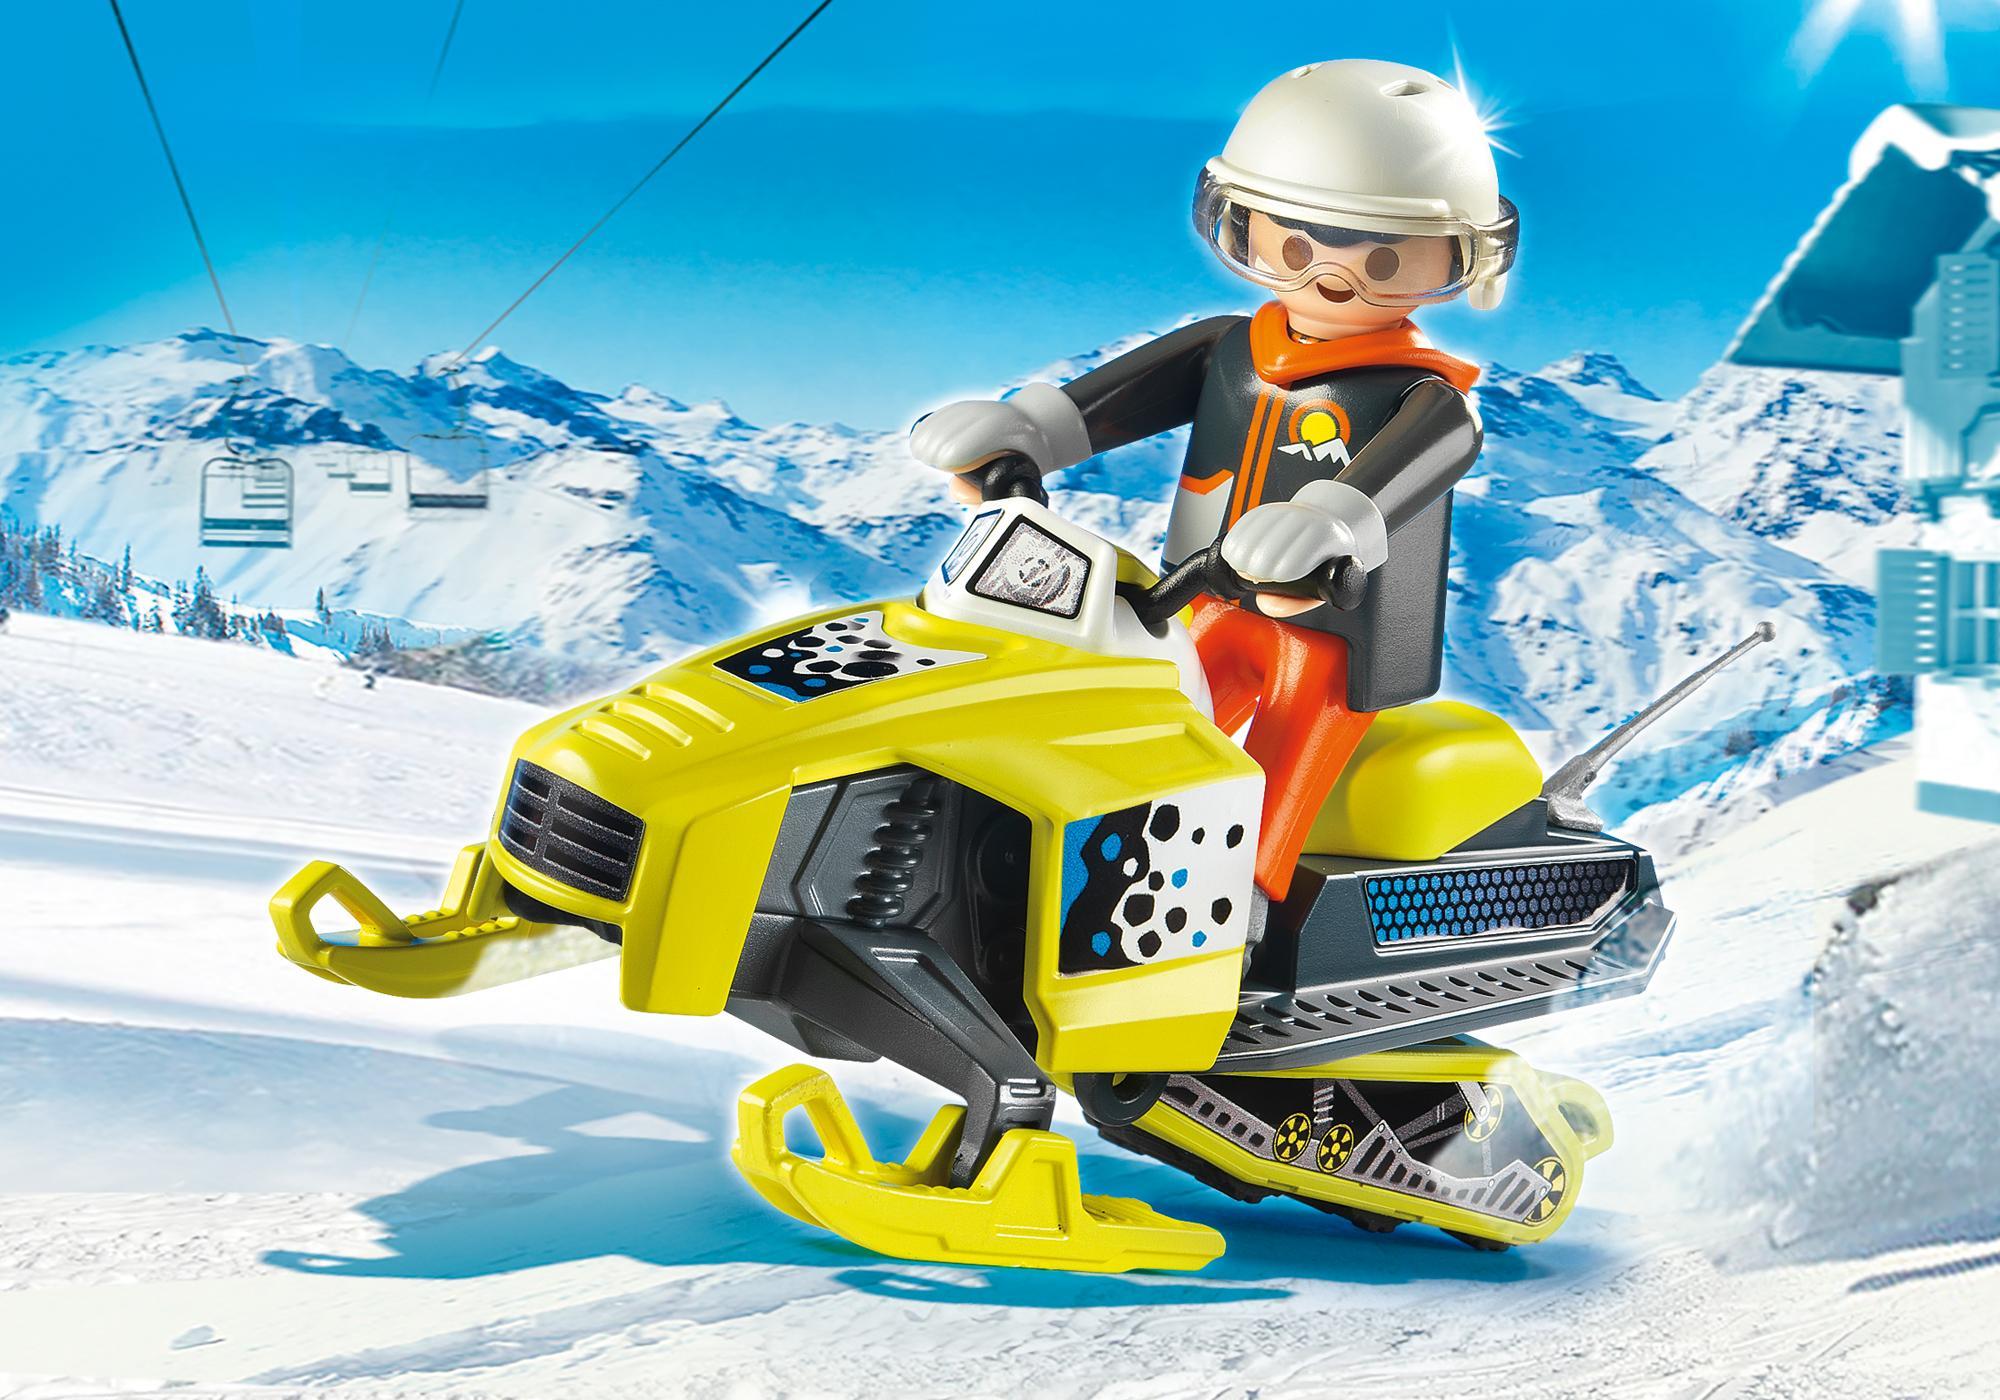 http://media.playmobil.com/i/playmobil/9285_product_detail/Sneeuwscooter